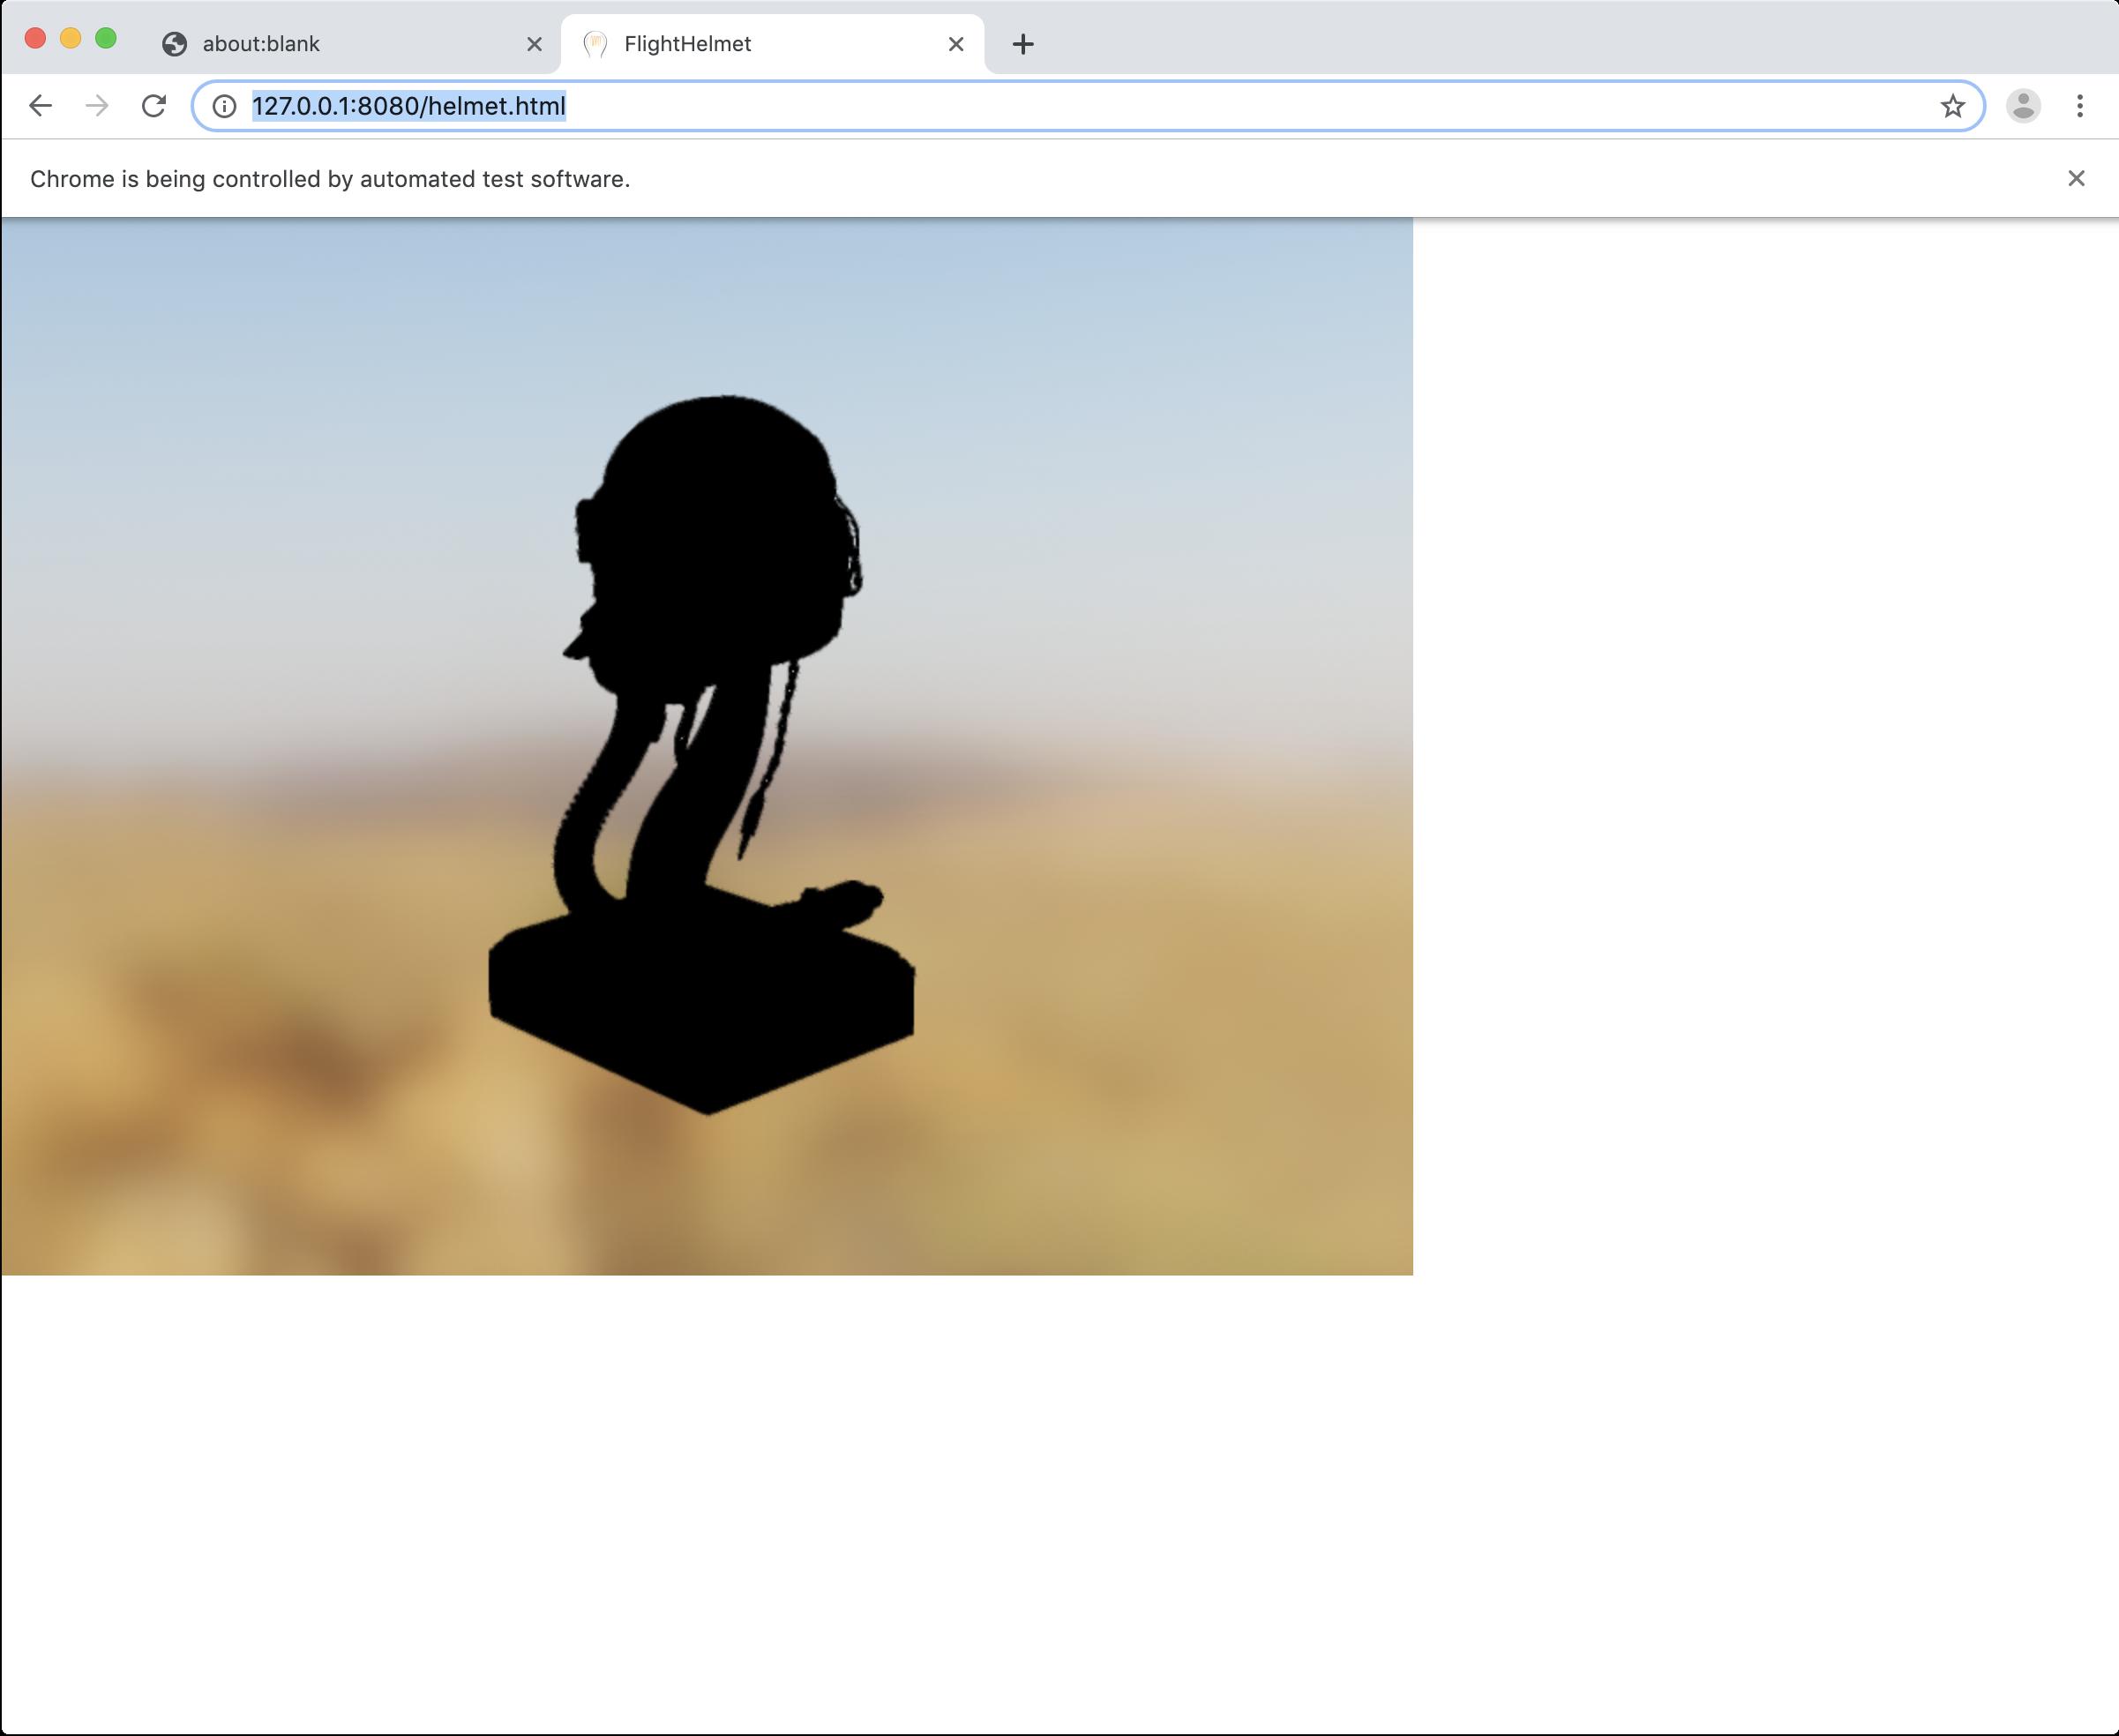 glTF models are black with WebGL + SwiftShader · Issue #1380